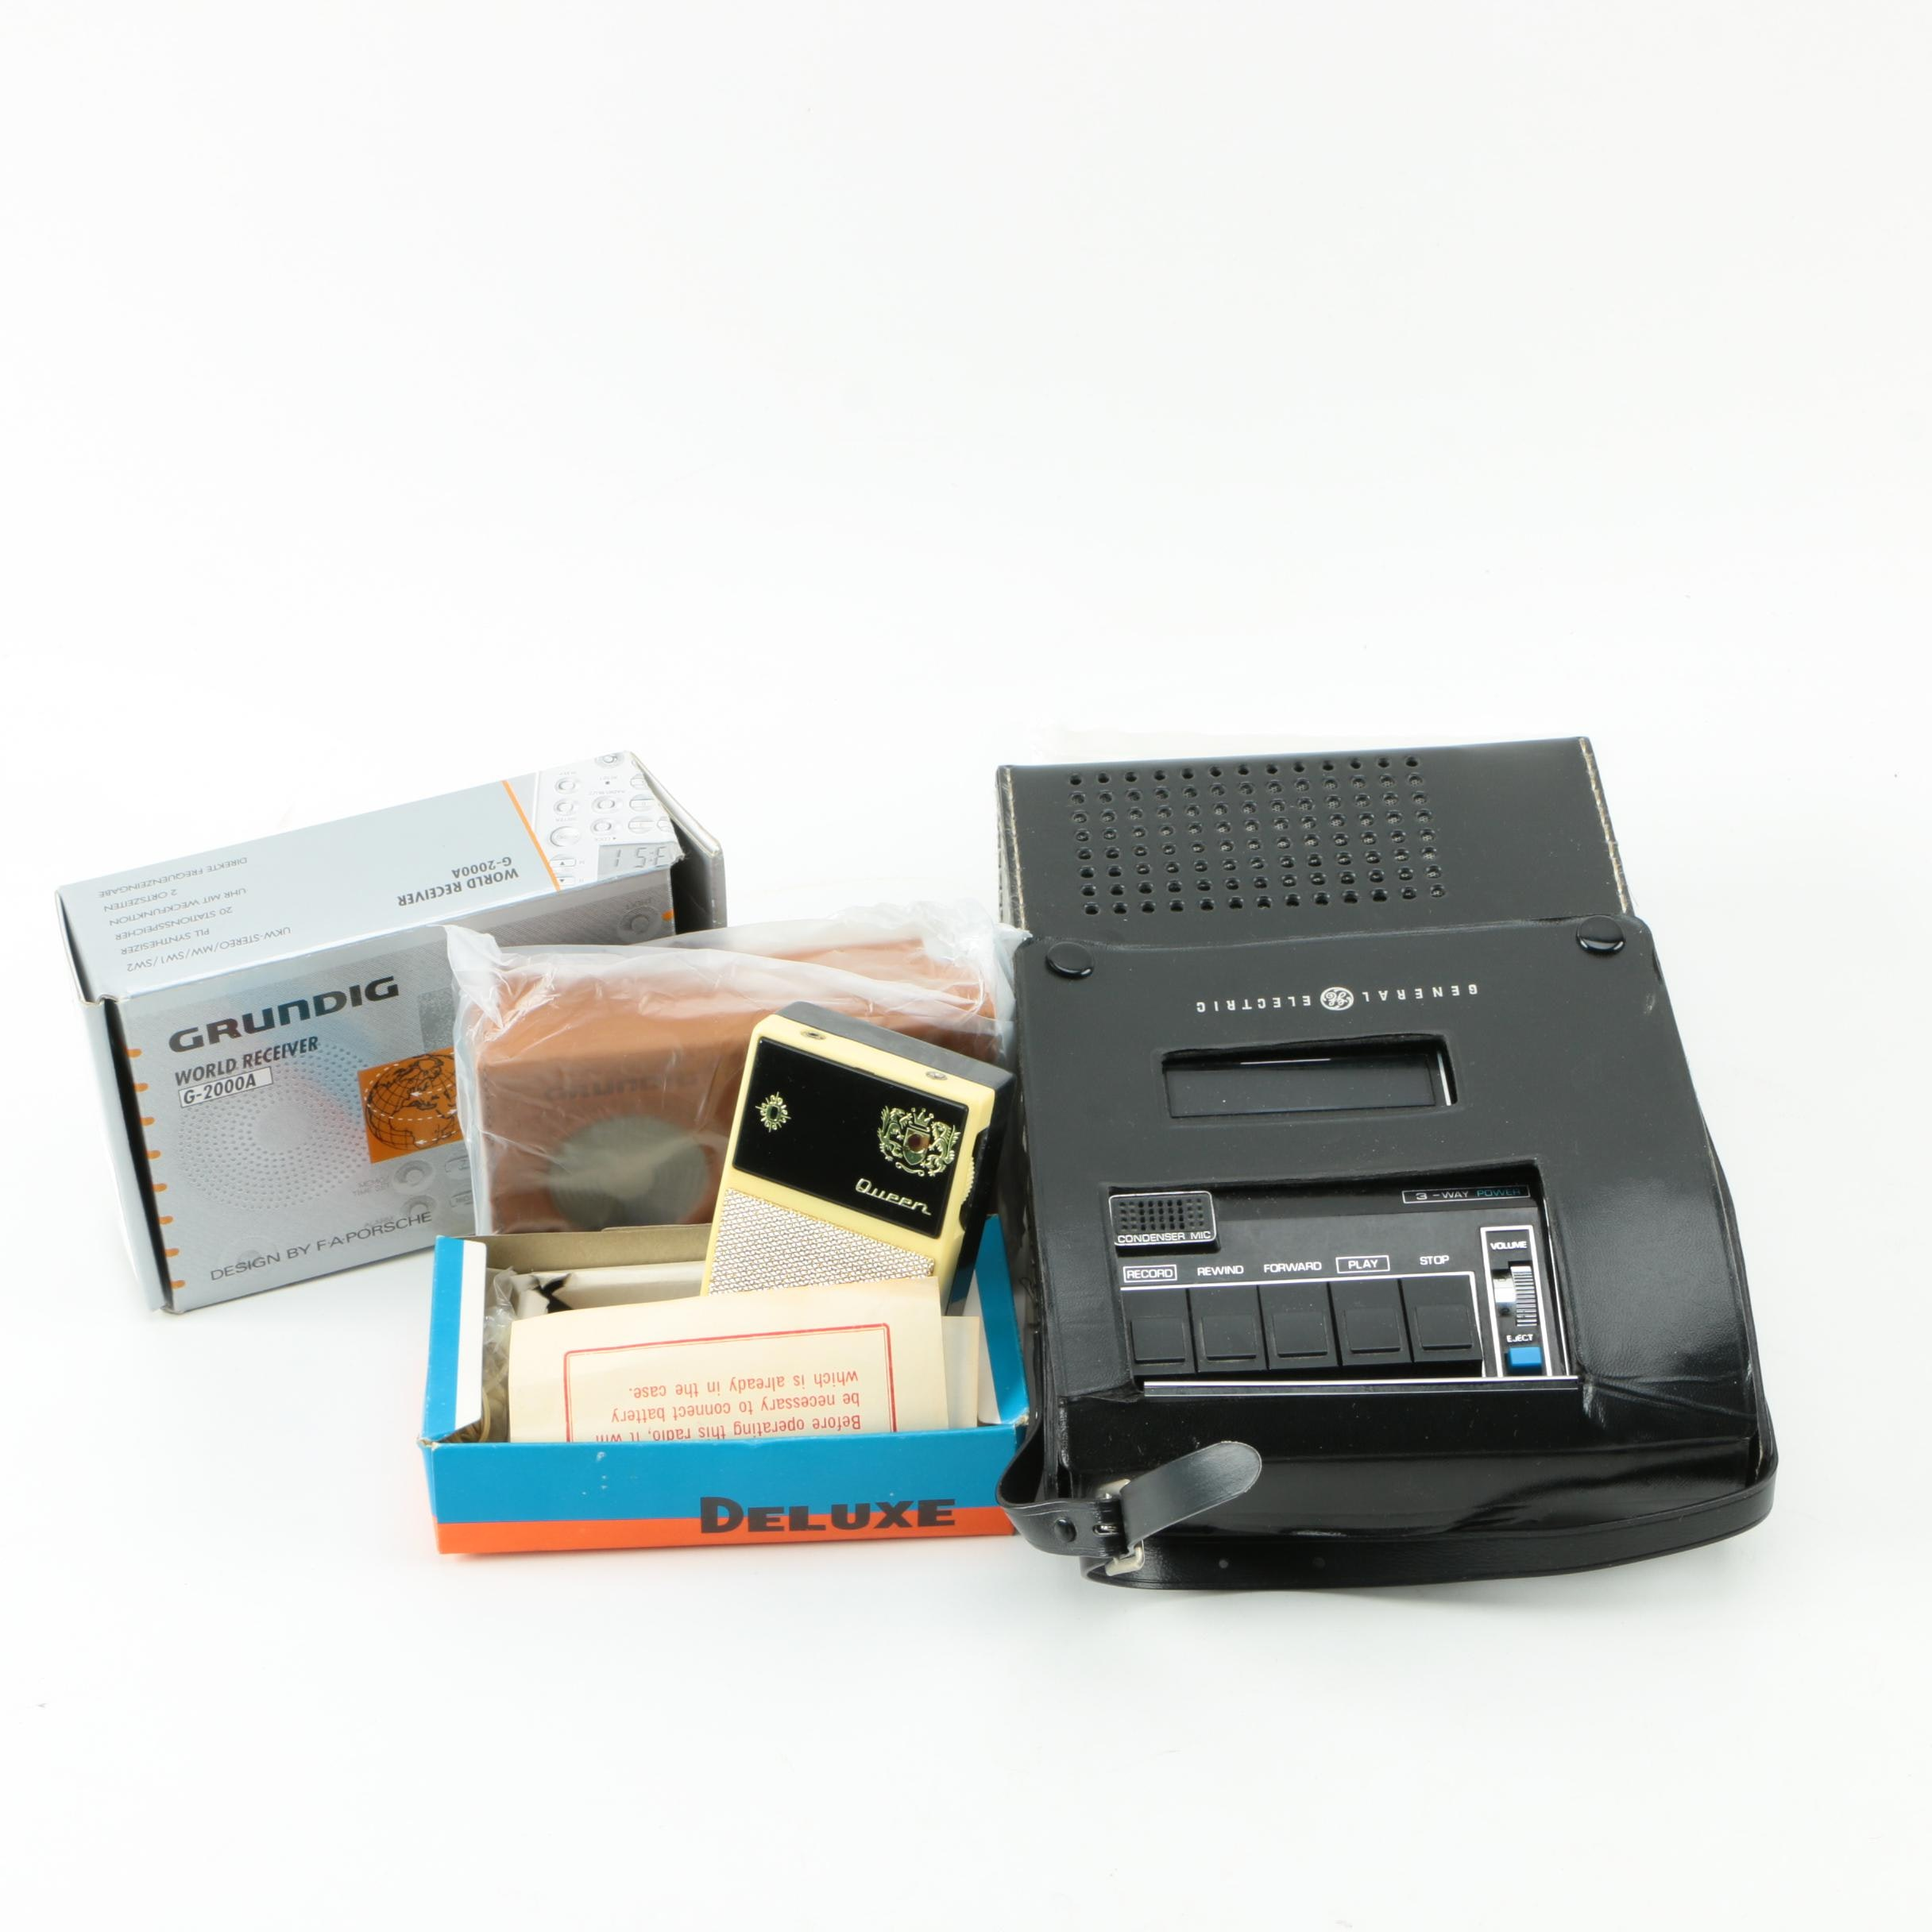 Vintage Tape Recorder And Radios Ebth